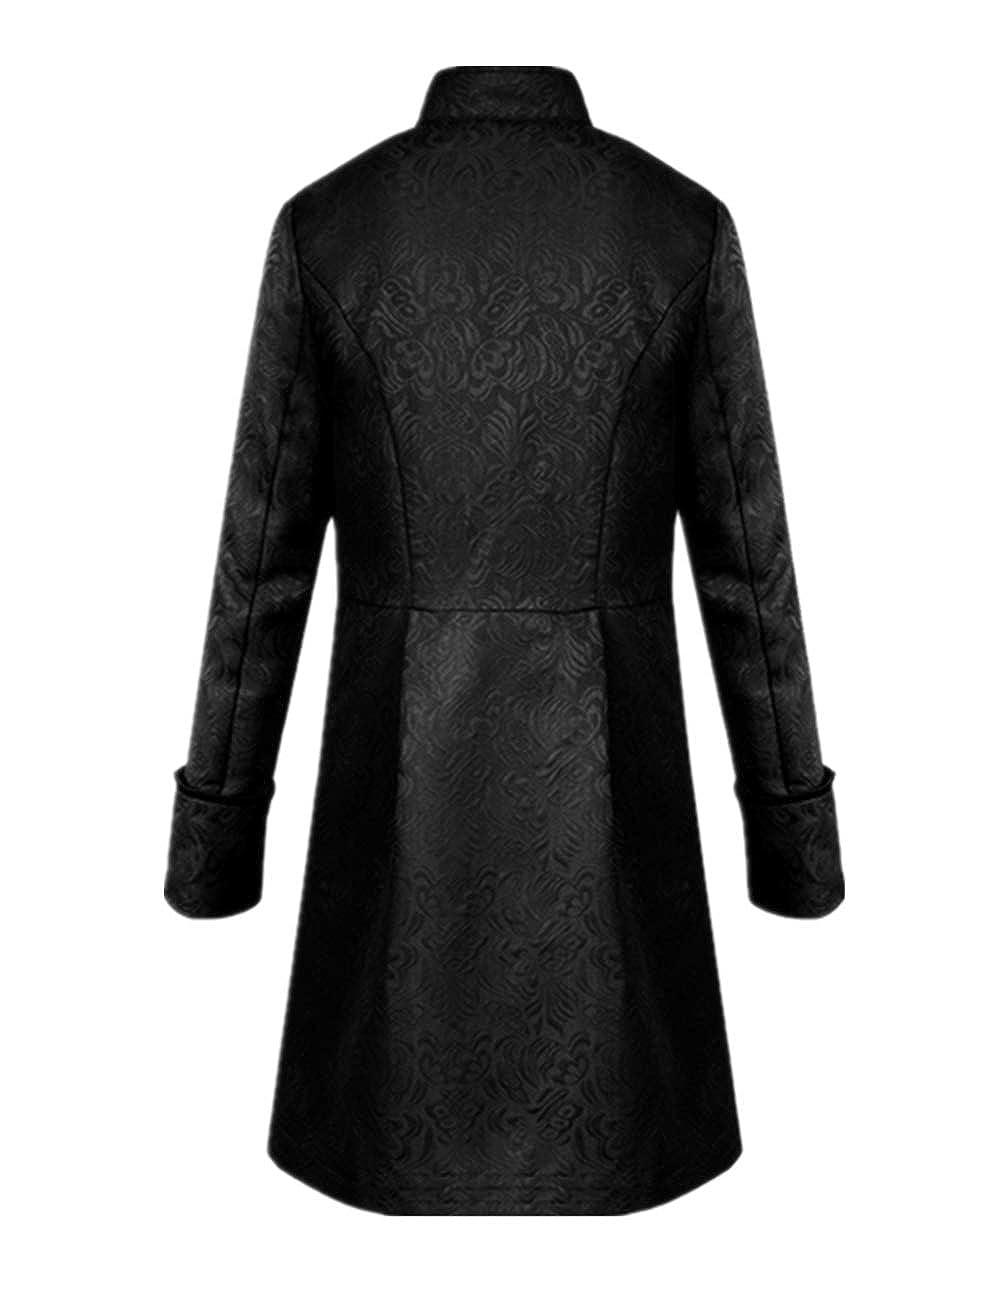 Tinyones Mens Steampunk Vintage Tailcoat Jacket Gothic Victorian Frock Coat Uniform Halloween Costume